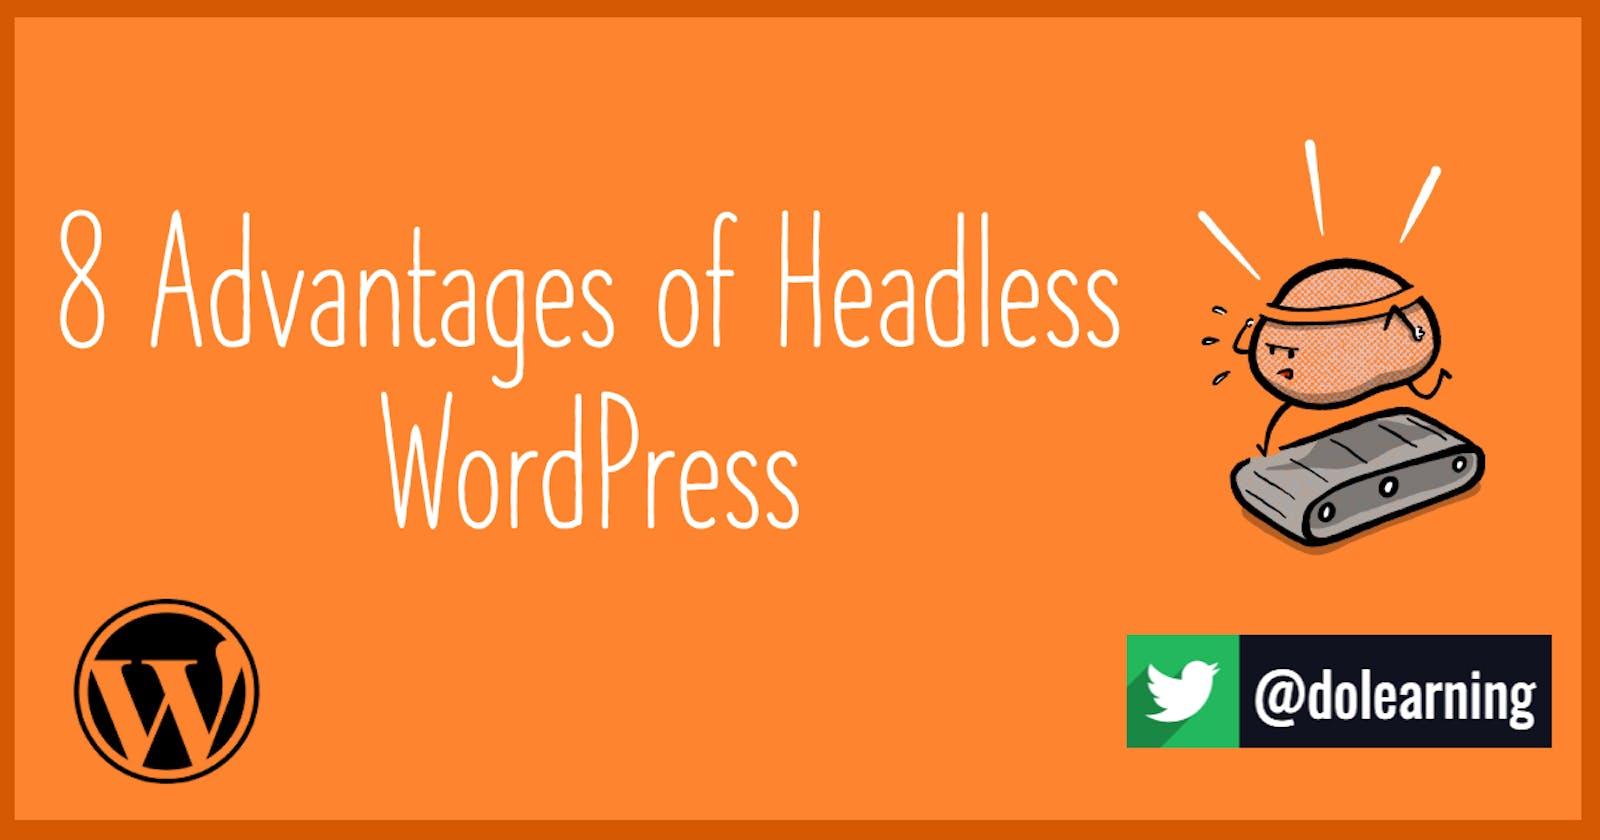 8 Advantages of Headless WordPress